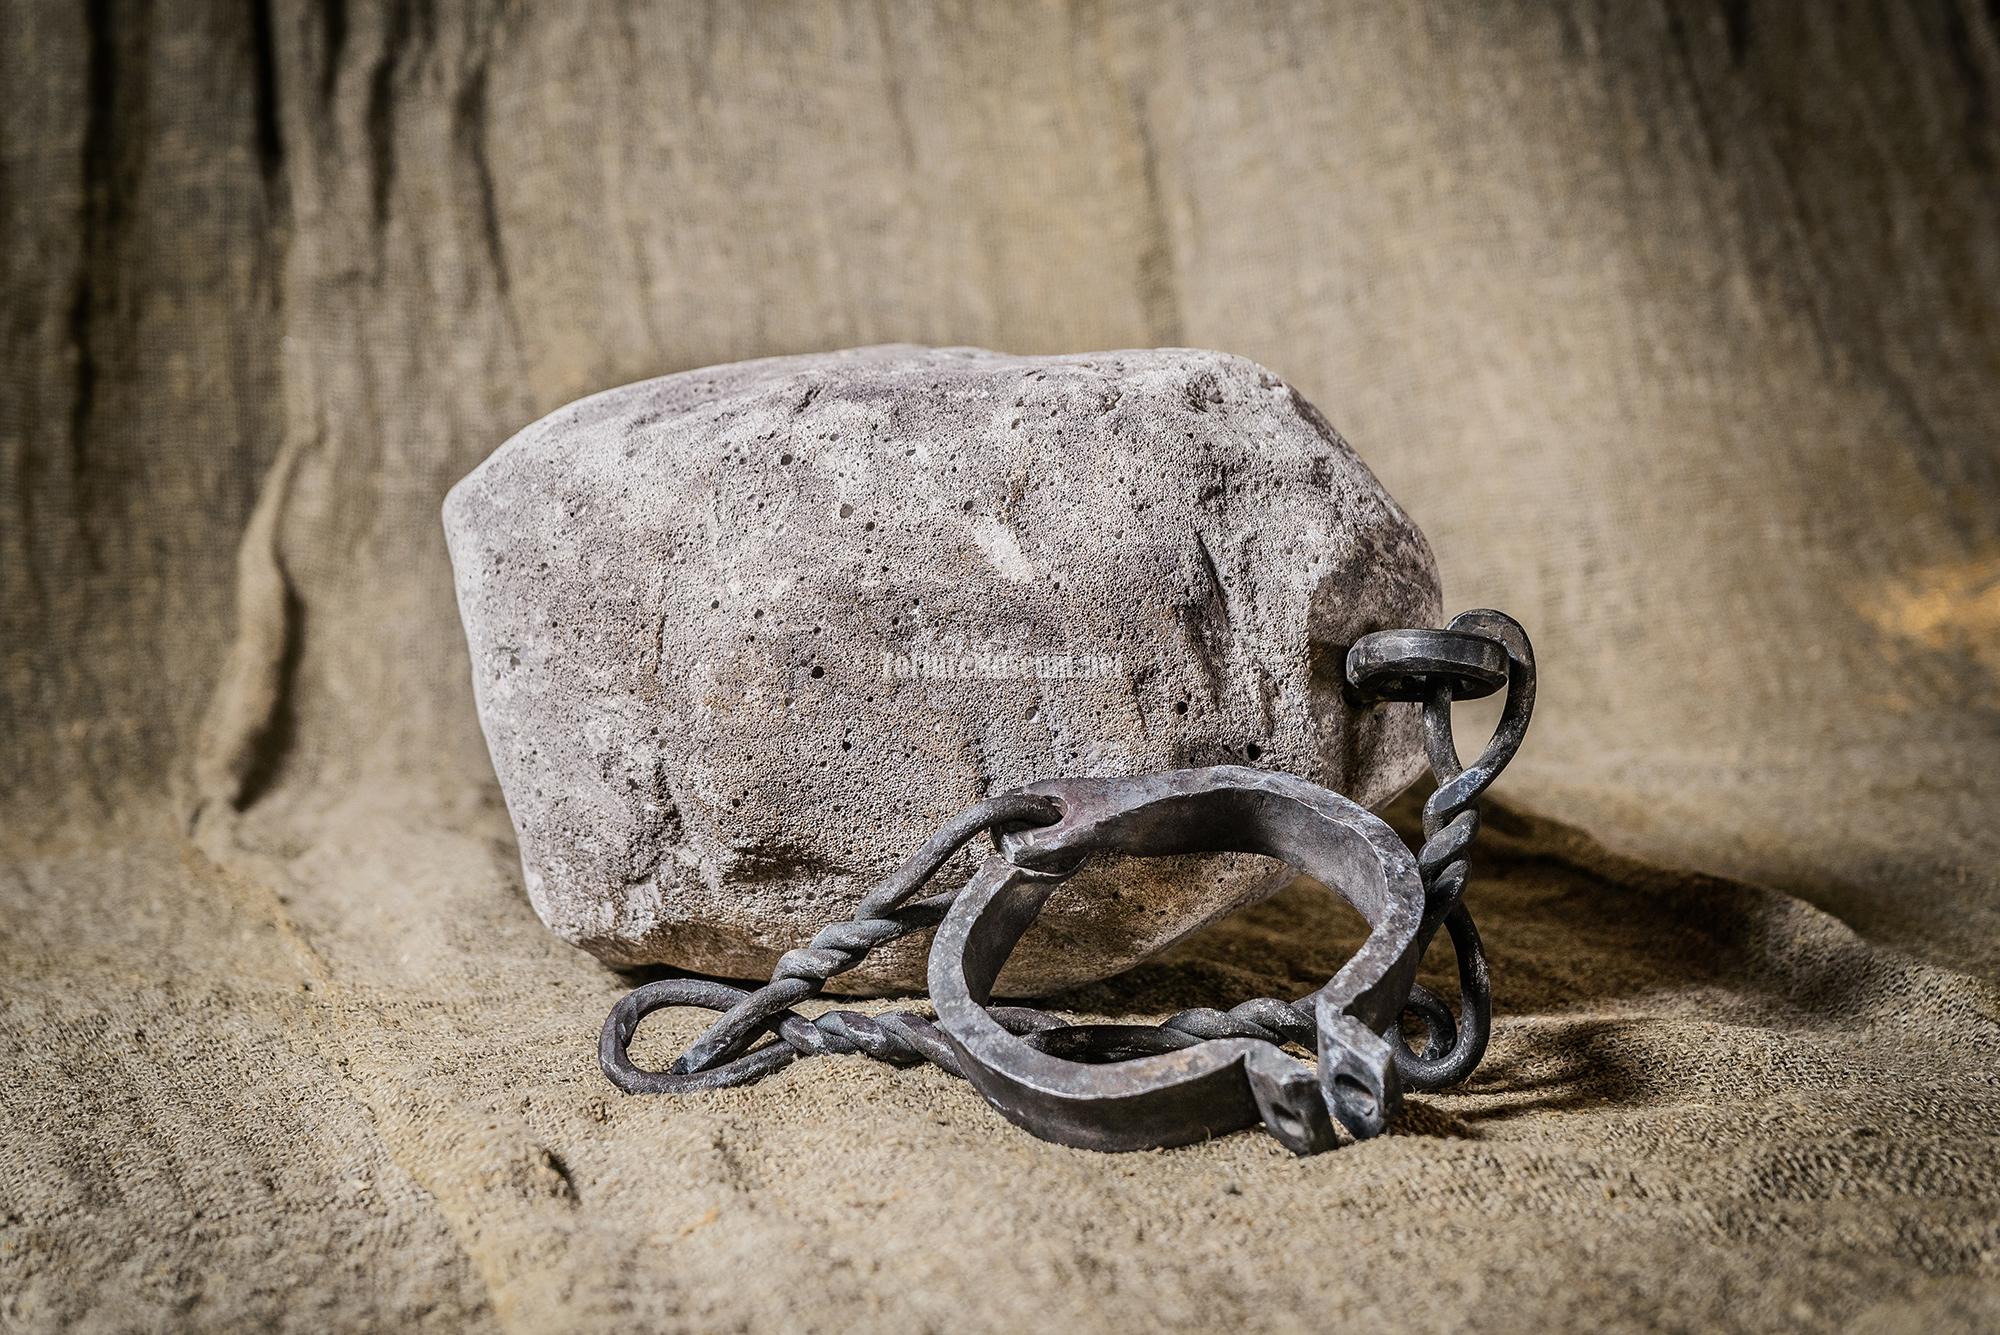 Кандалы и цепи на рабах фото 696-914